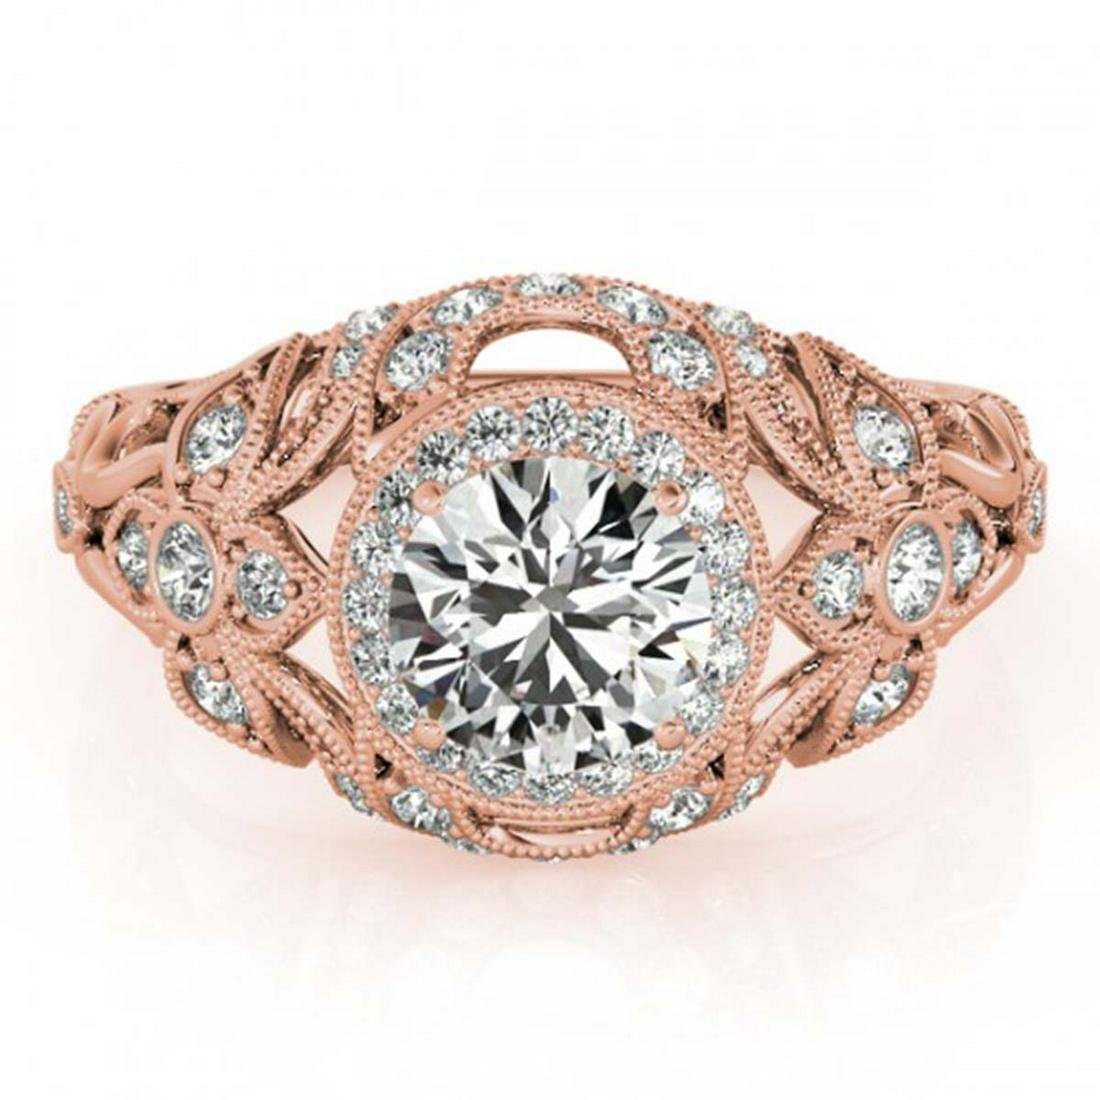 1.25 ctw VS/SI Diamond Ring 18K Rose Gold - REF-167F7N